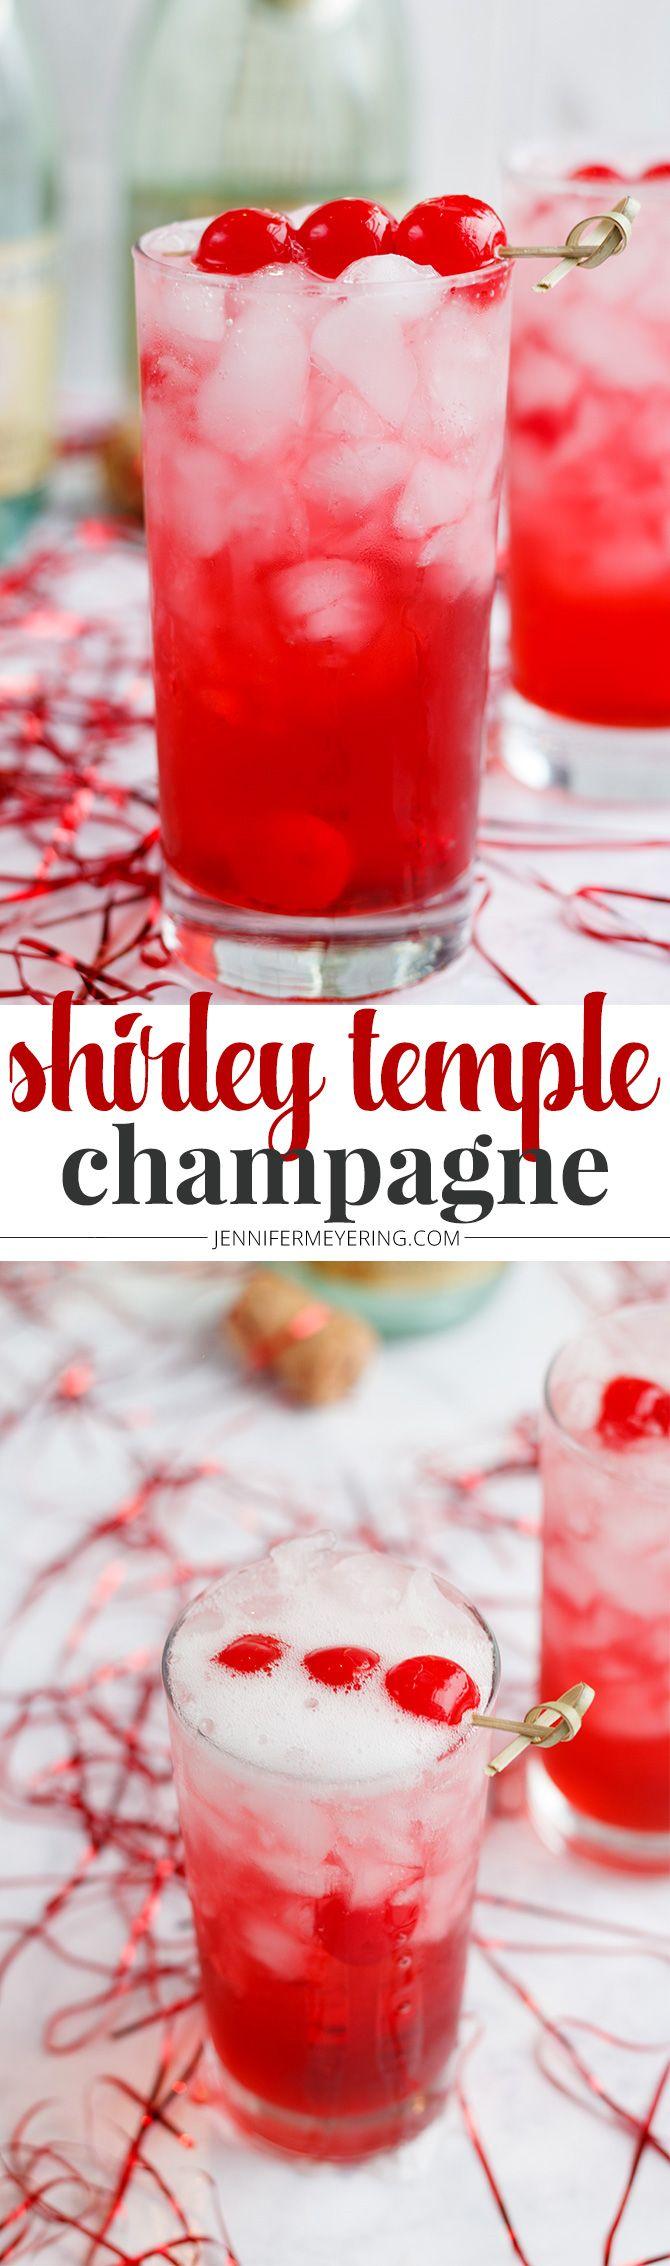 Shirley Temple Champagne - JenniferMeyering.com